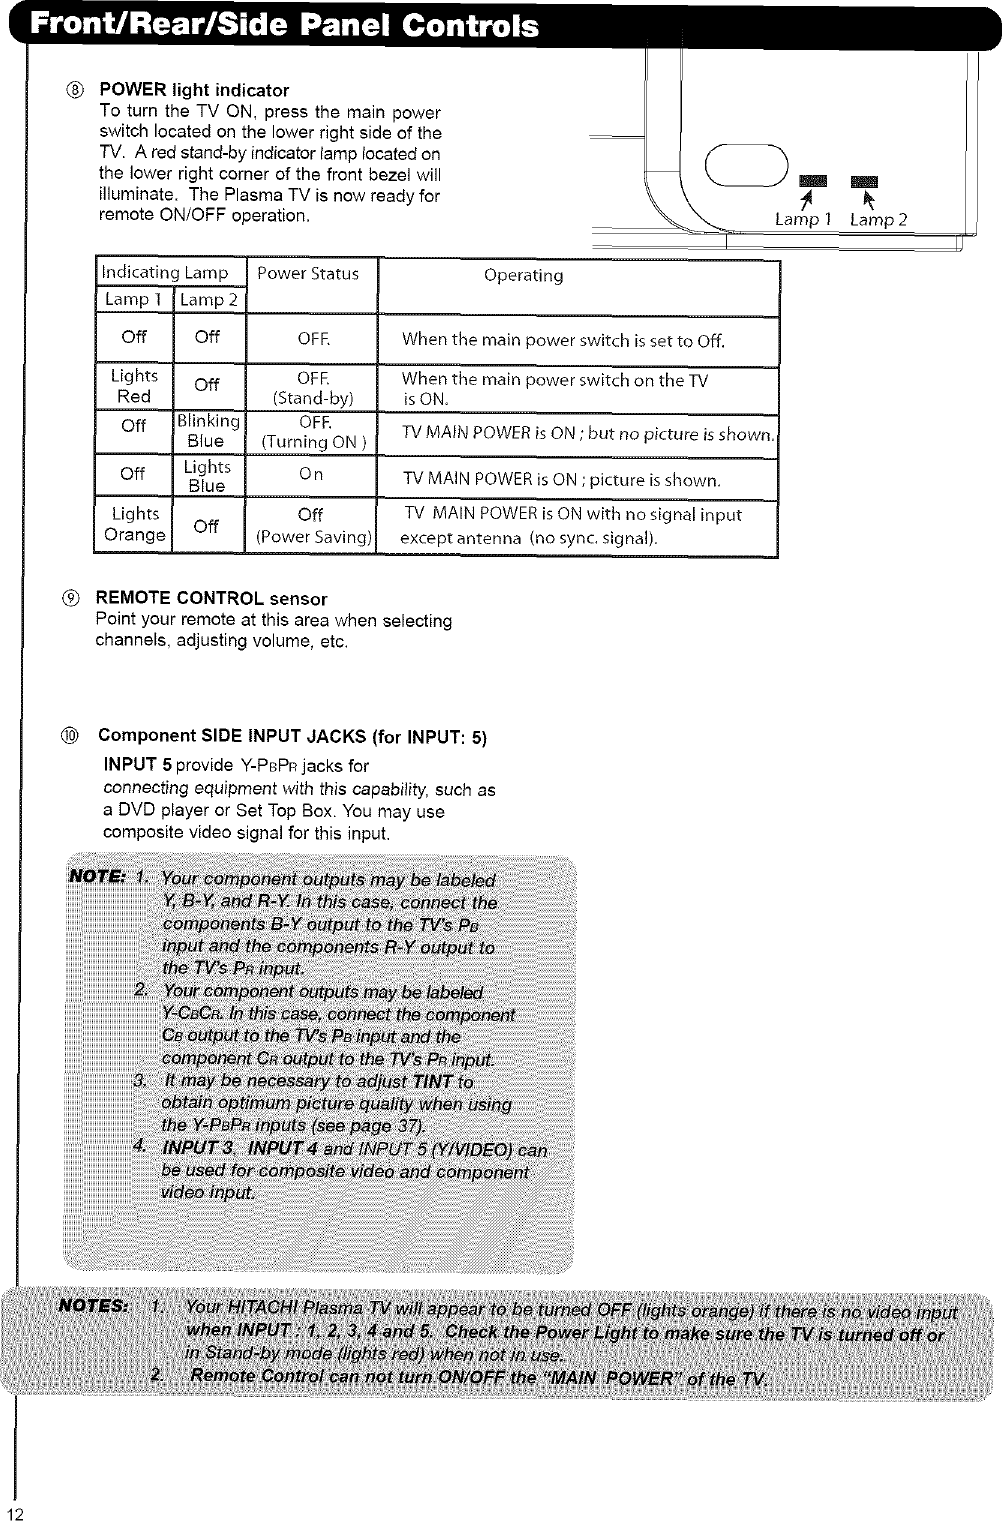 Hitachi 42HDS69 User Manual PLASMA TELEVISION Manuals And